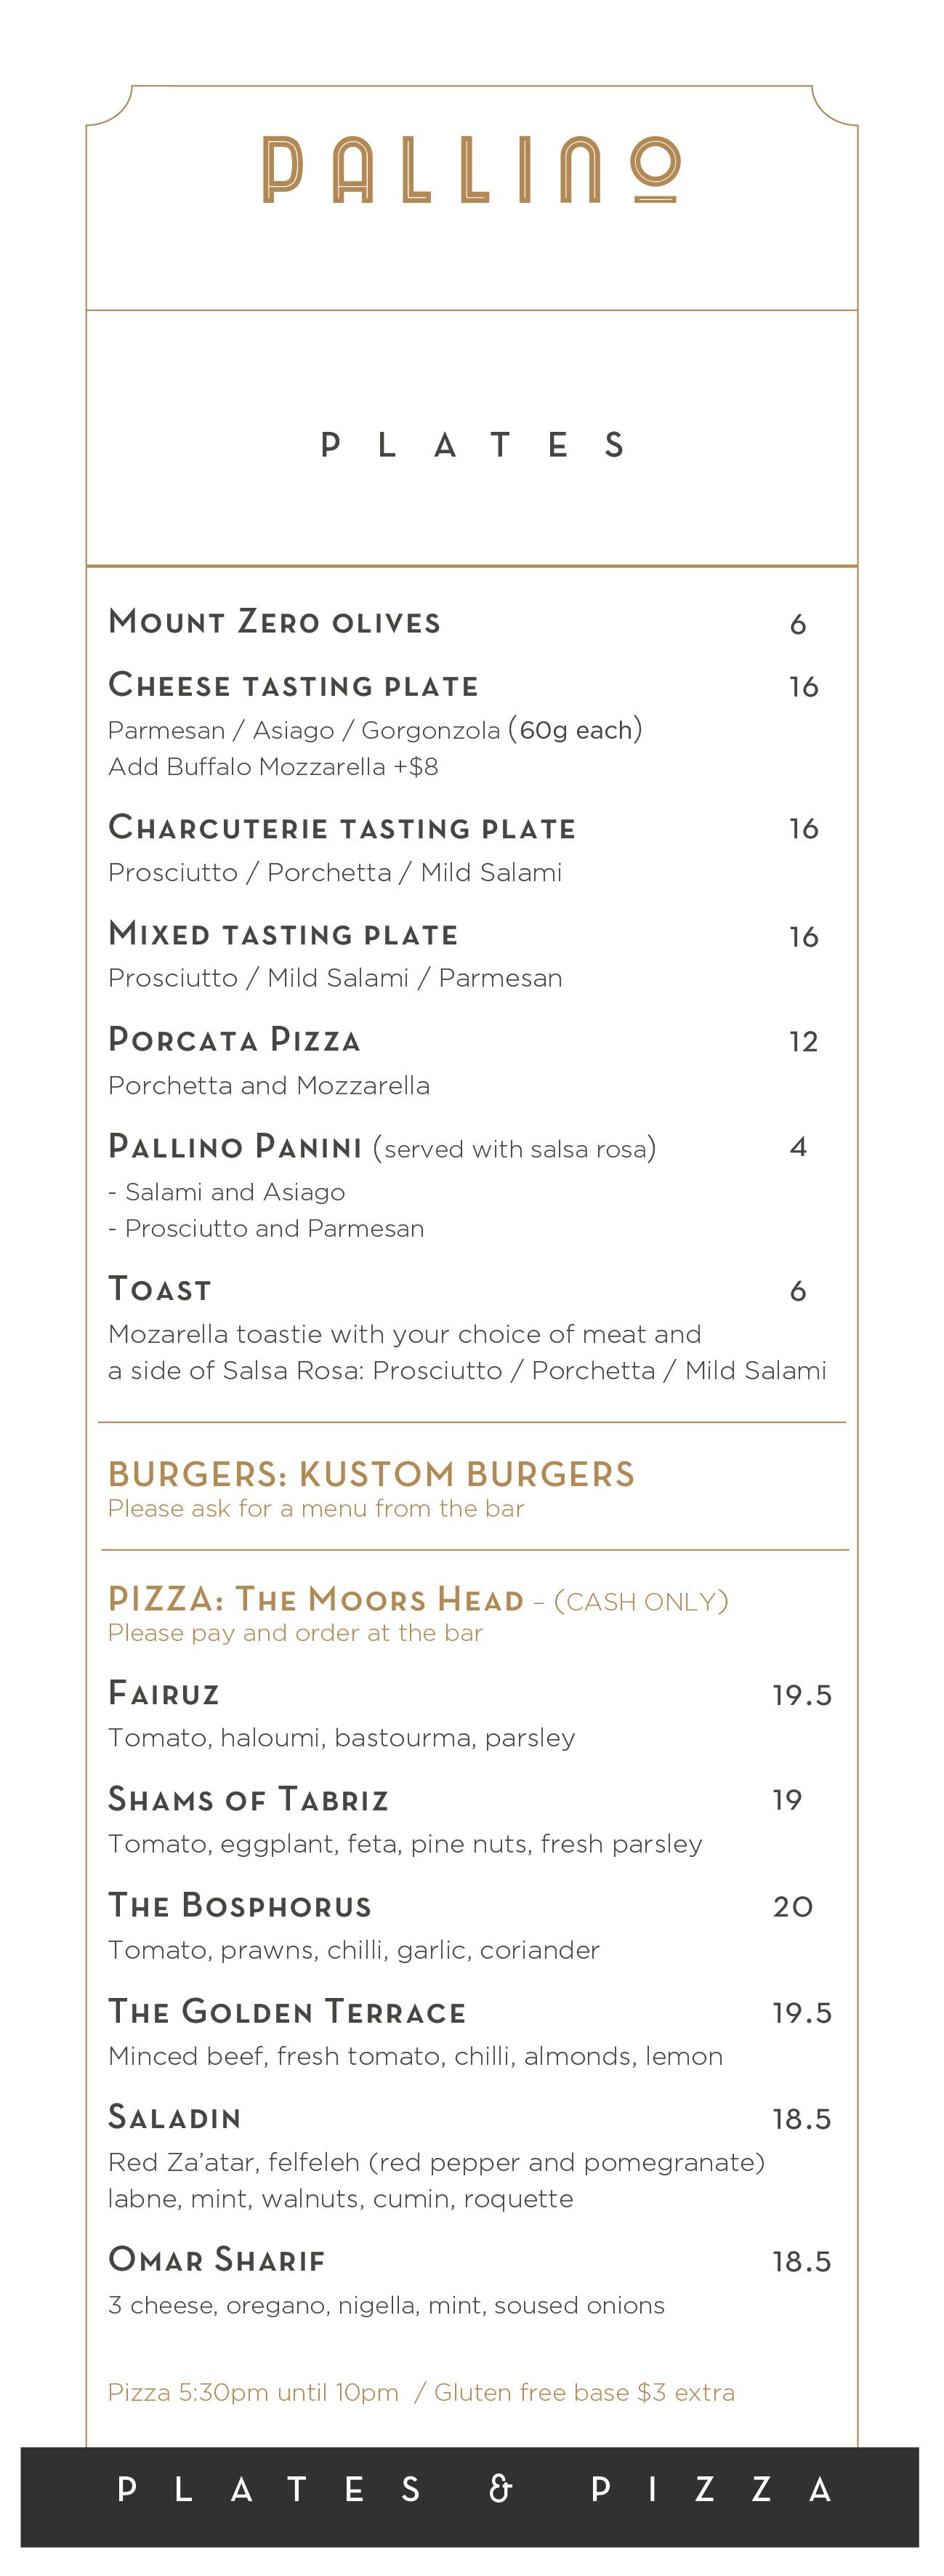 Pallino-Menu-Plates-Pizza